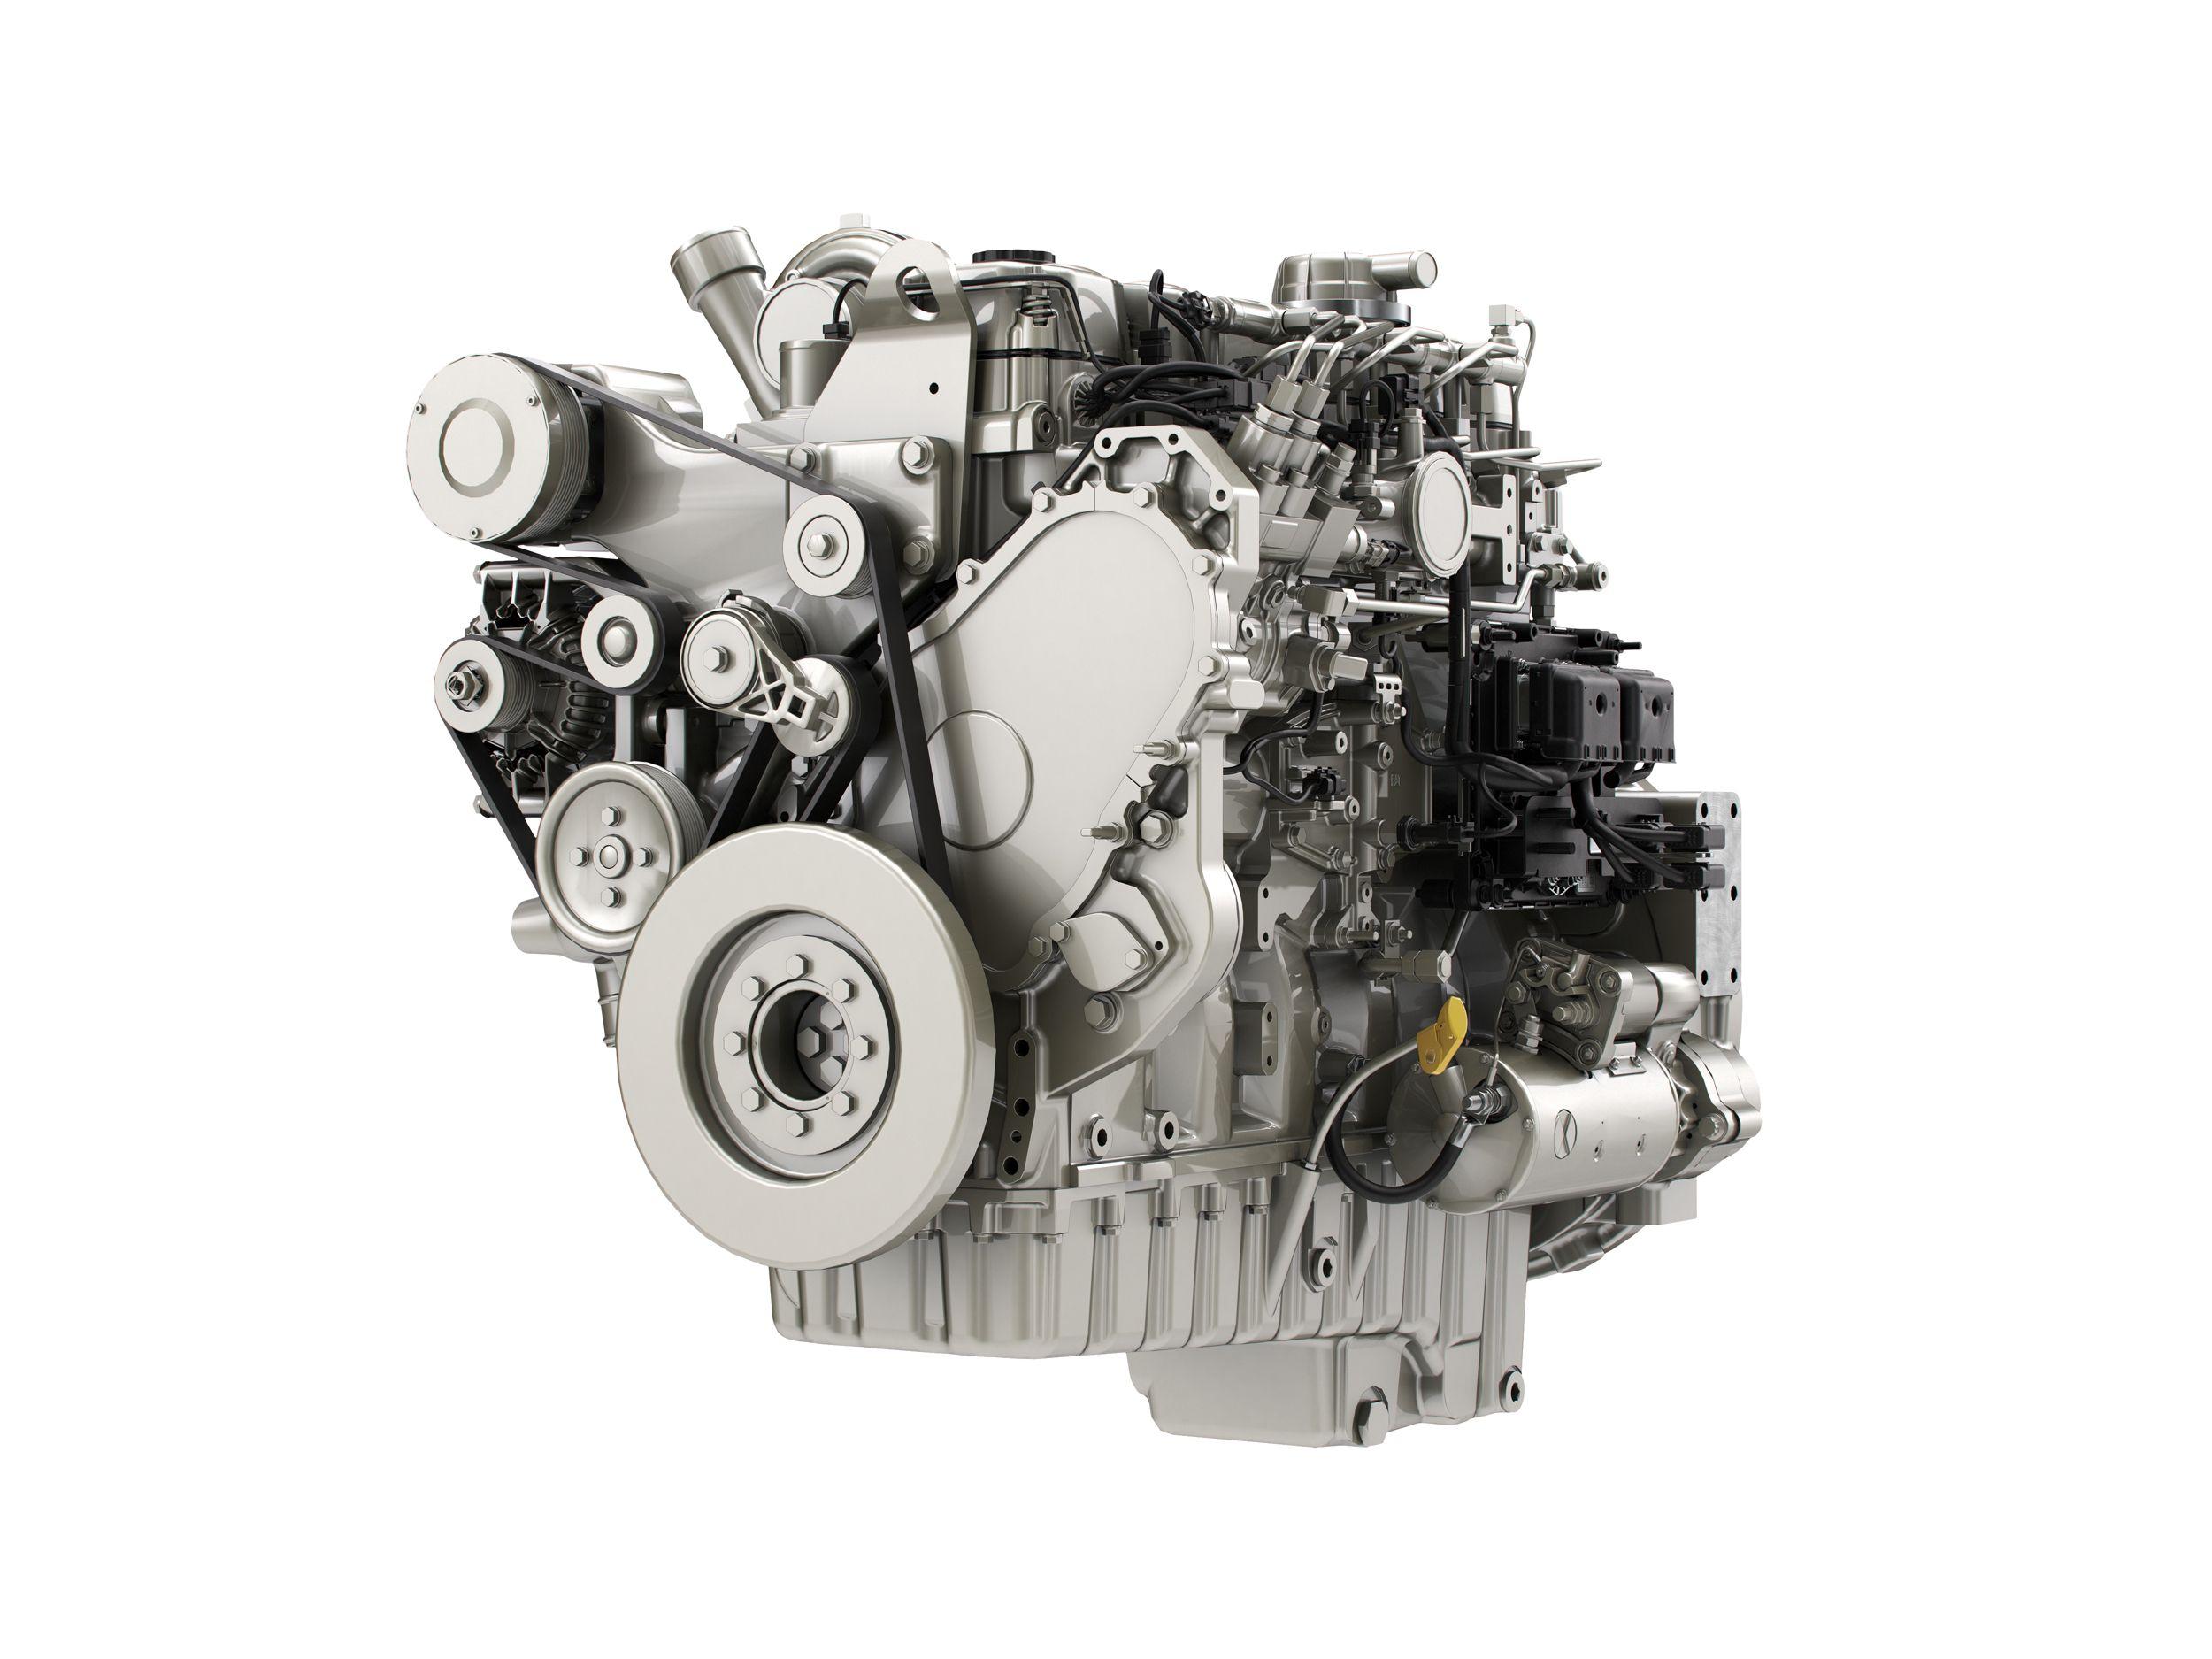 Perkins EU Stage V/U.S EPA Tier 4 Final engines on display at Intermat Paris 2018